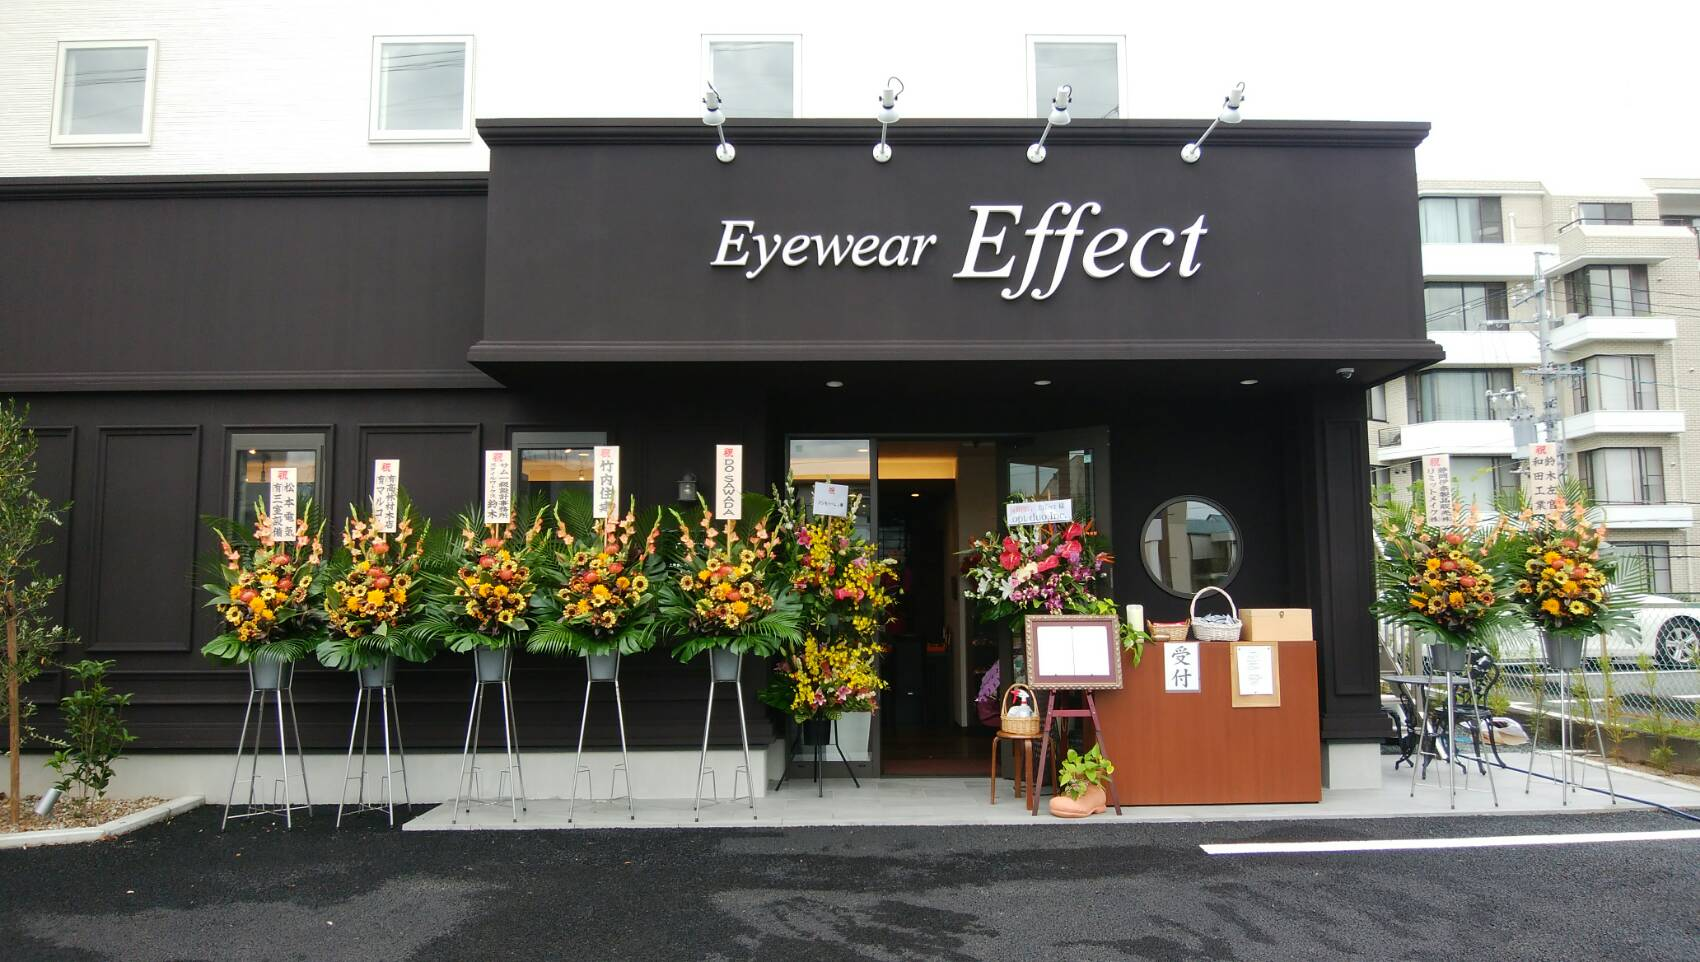 Eyewear Effect   静岡県浜松市のアイウェアショップ エフェクト